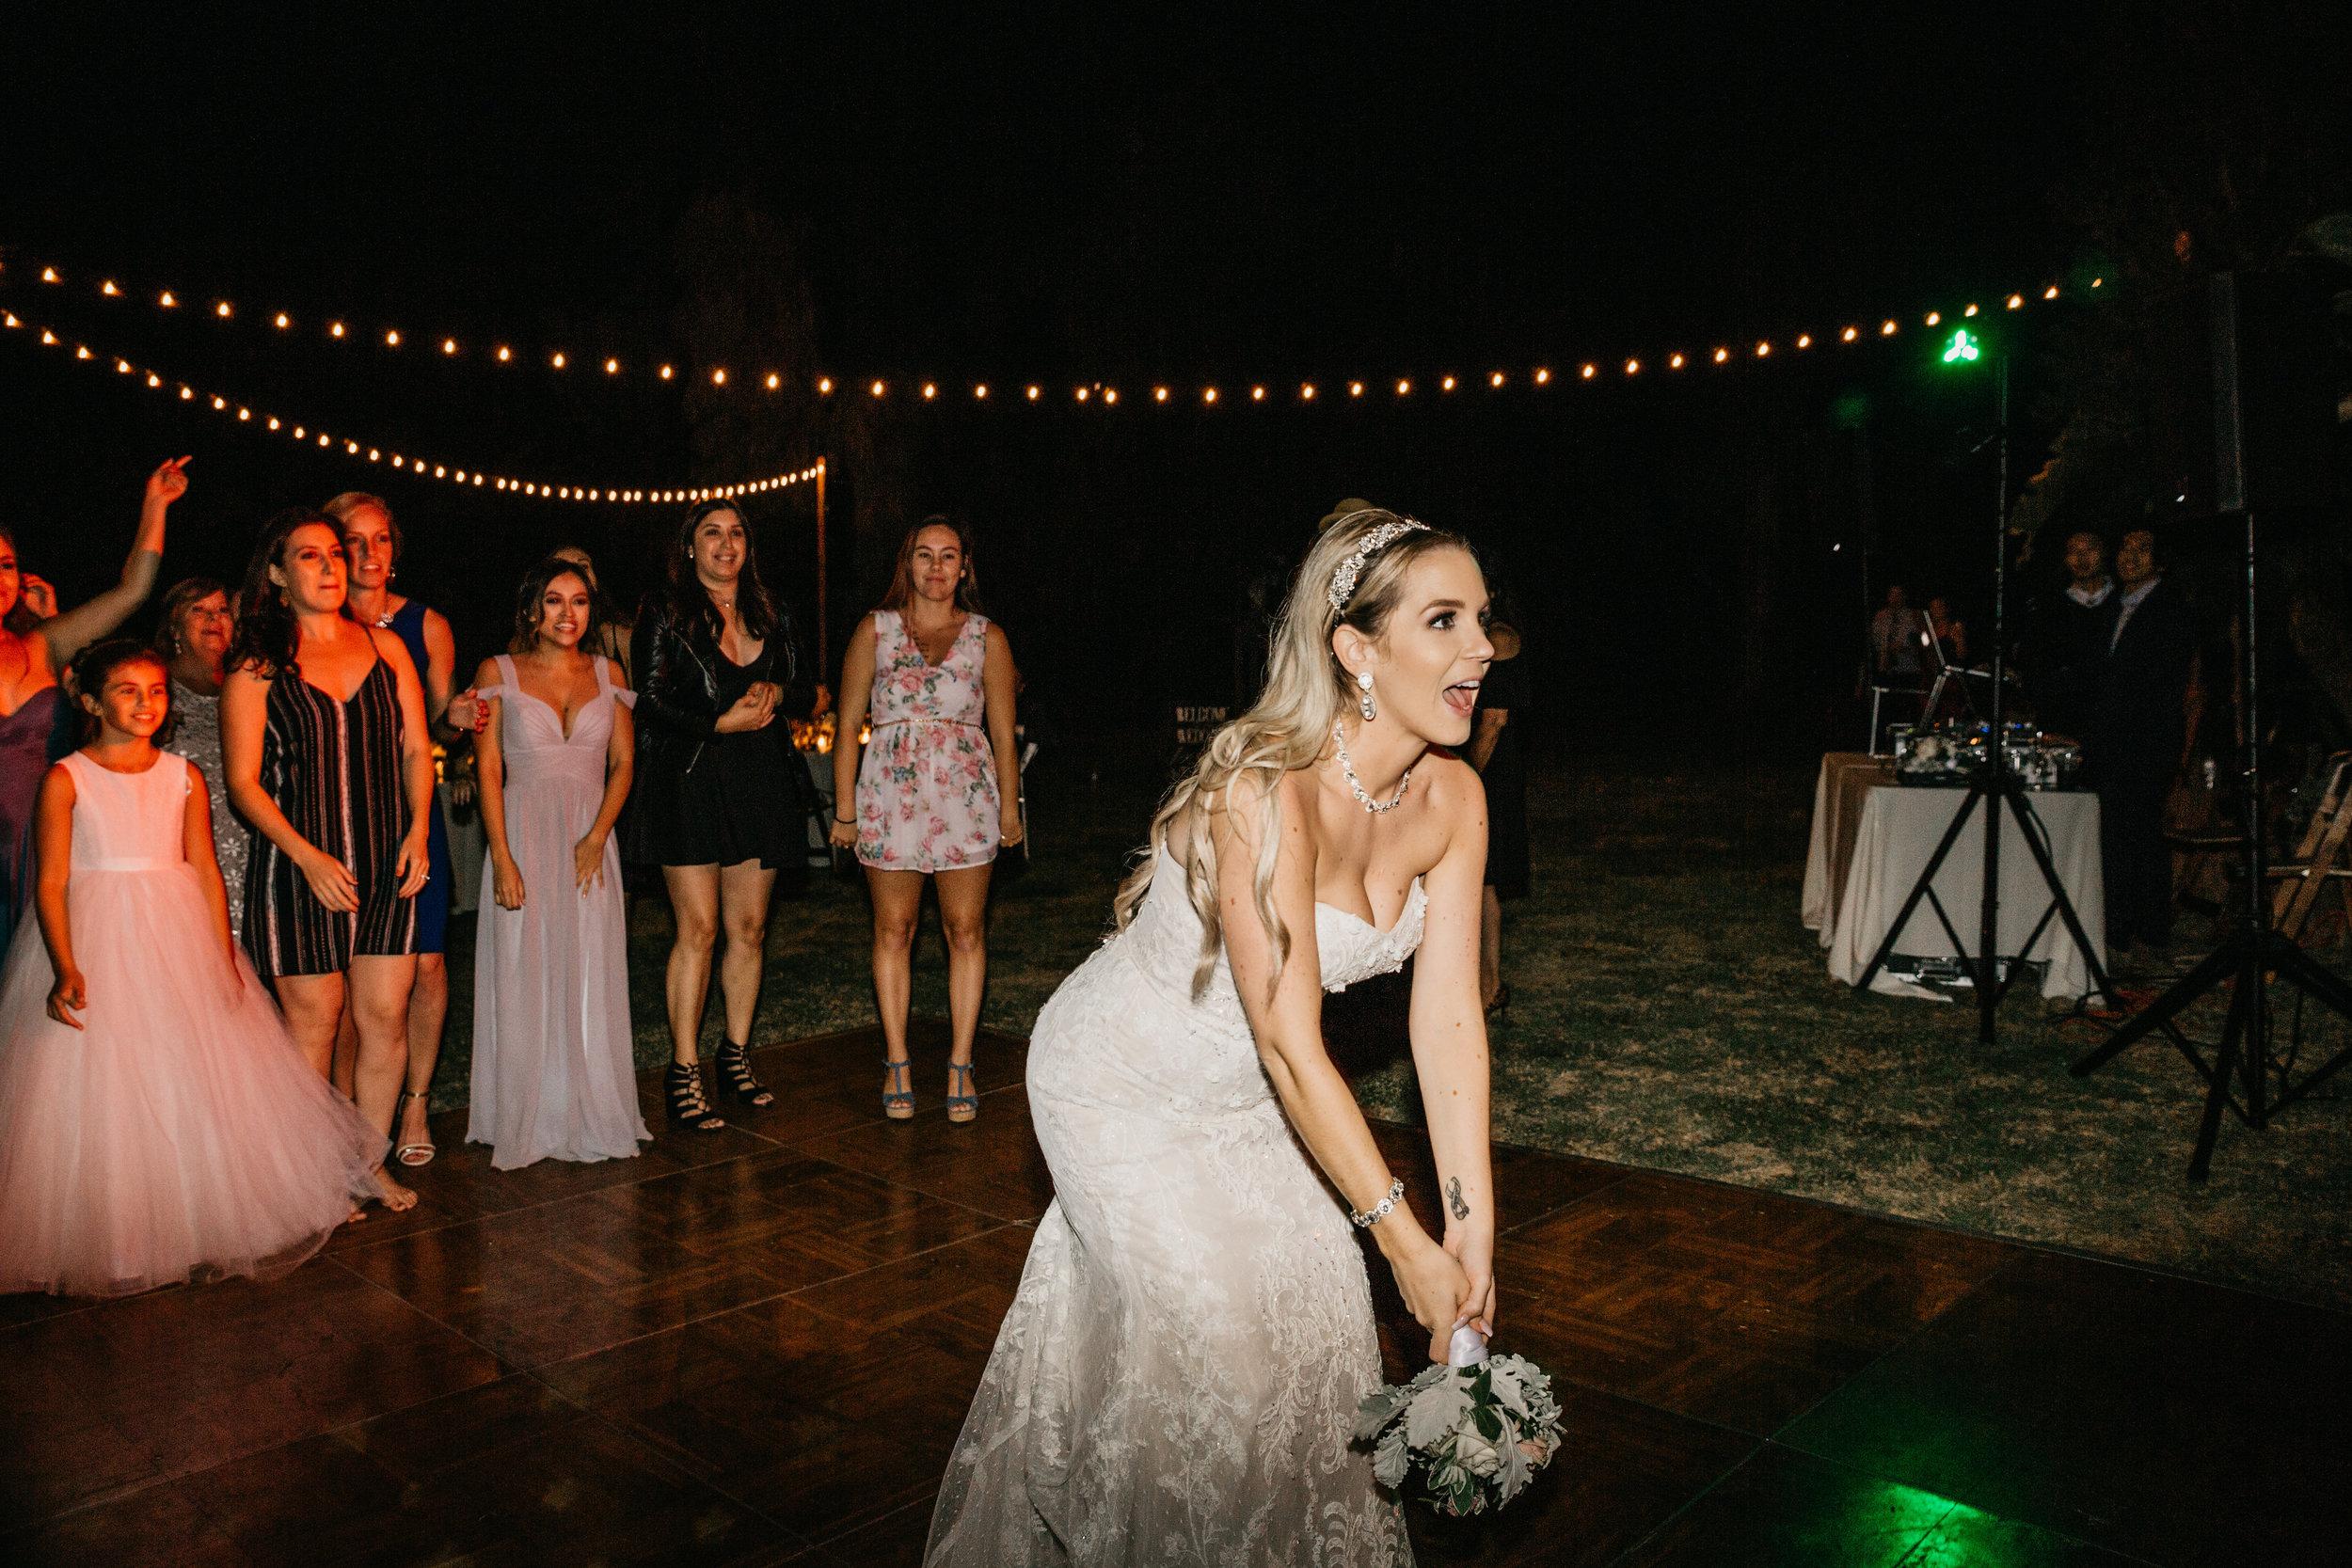 DianaLakePhoto-L+M-San-Diego-Wedding-Reception183.jpg